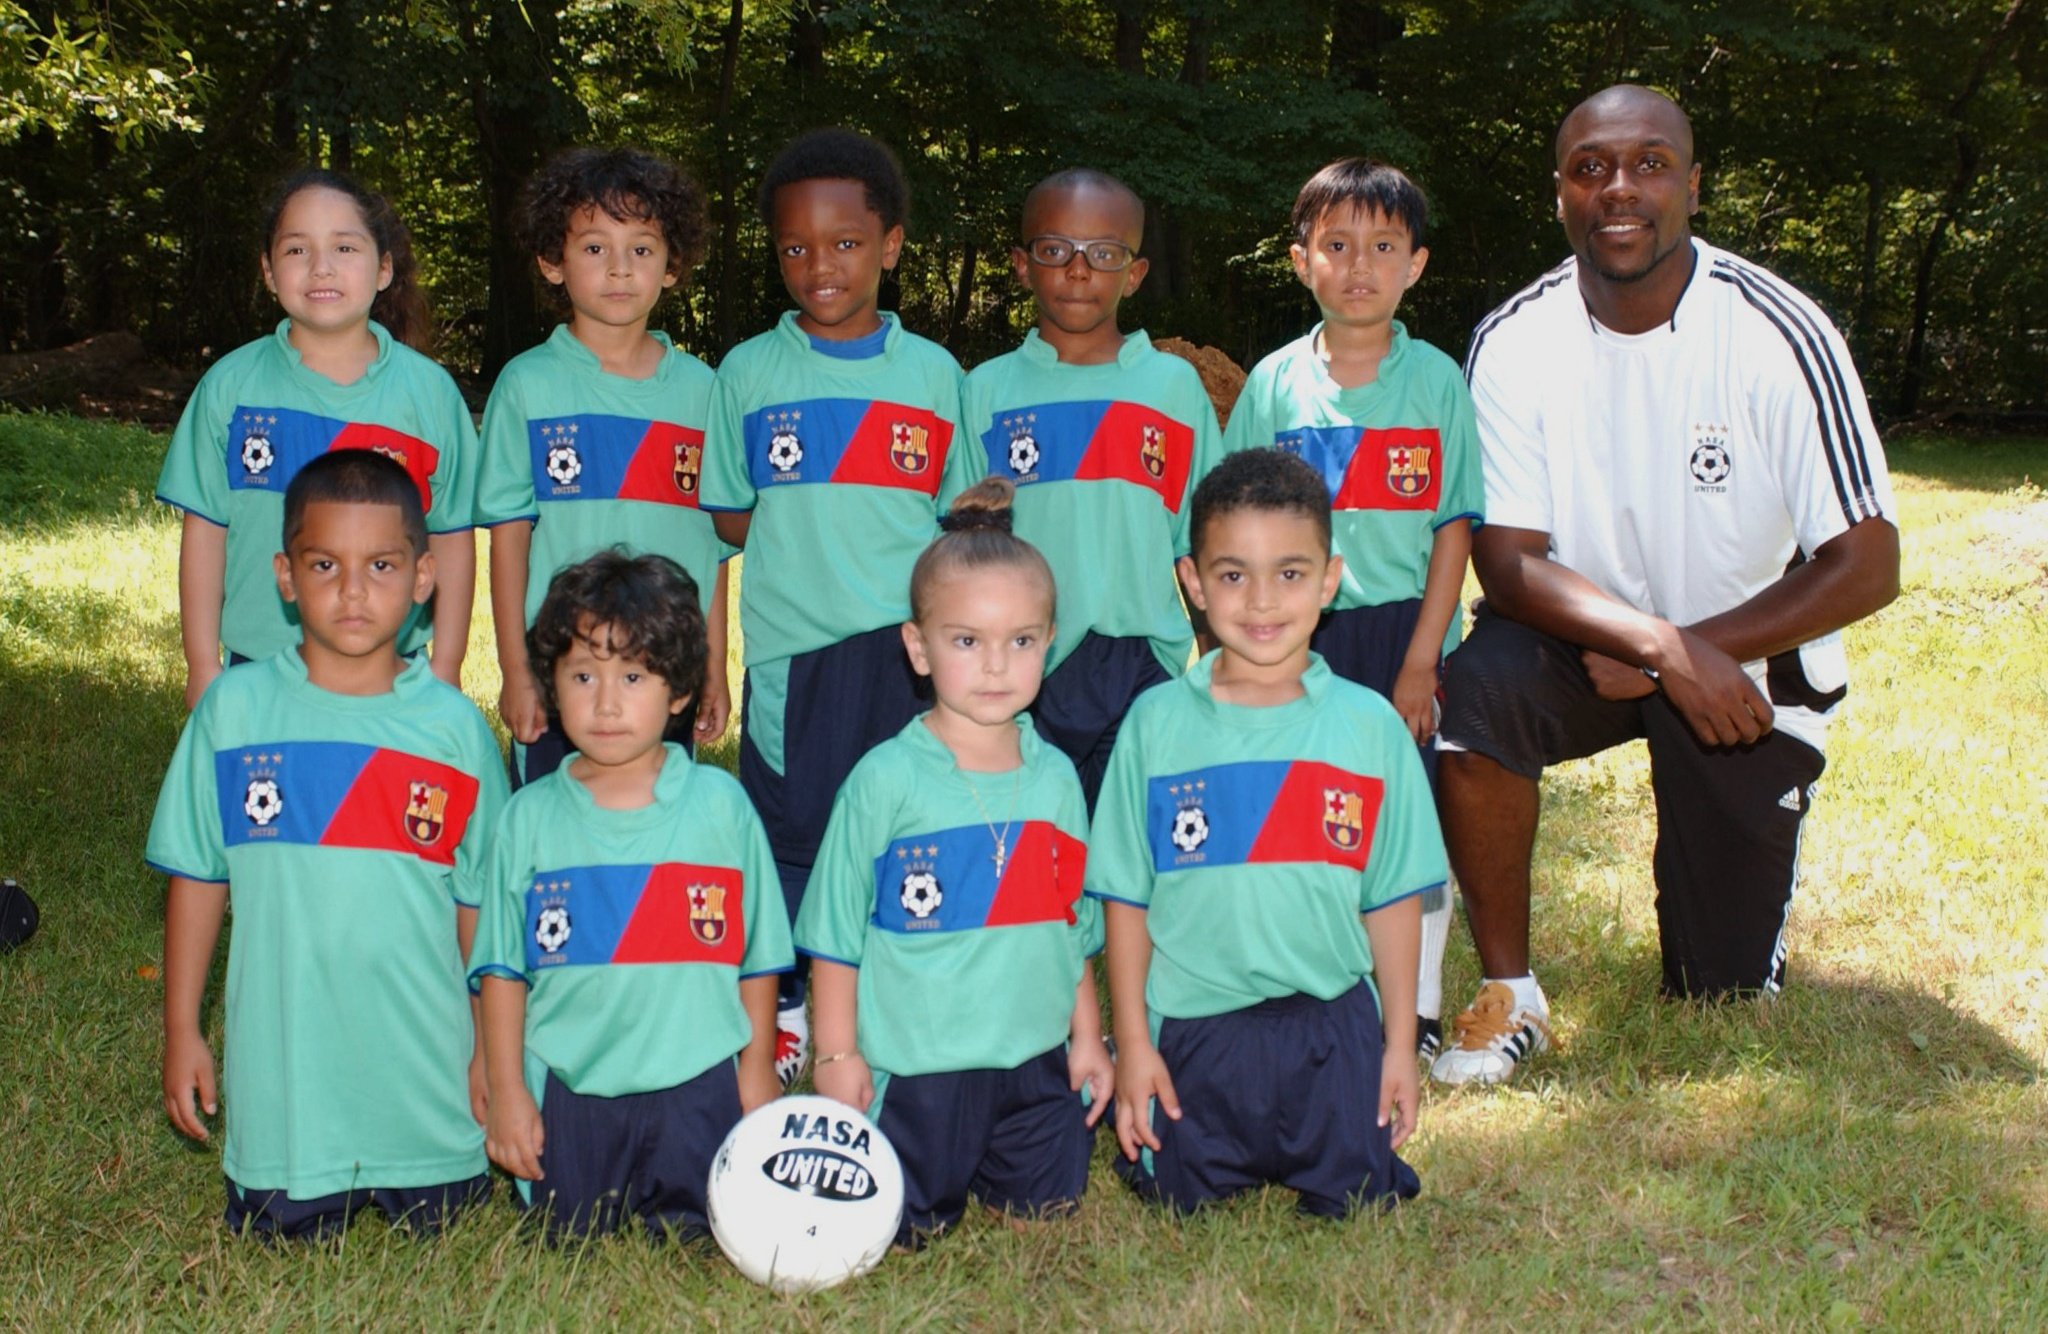 nasa soccer girls - photo #11